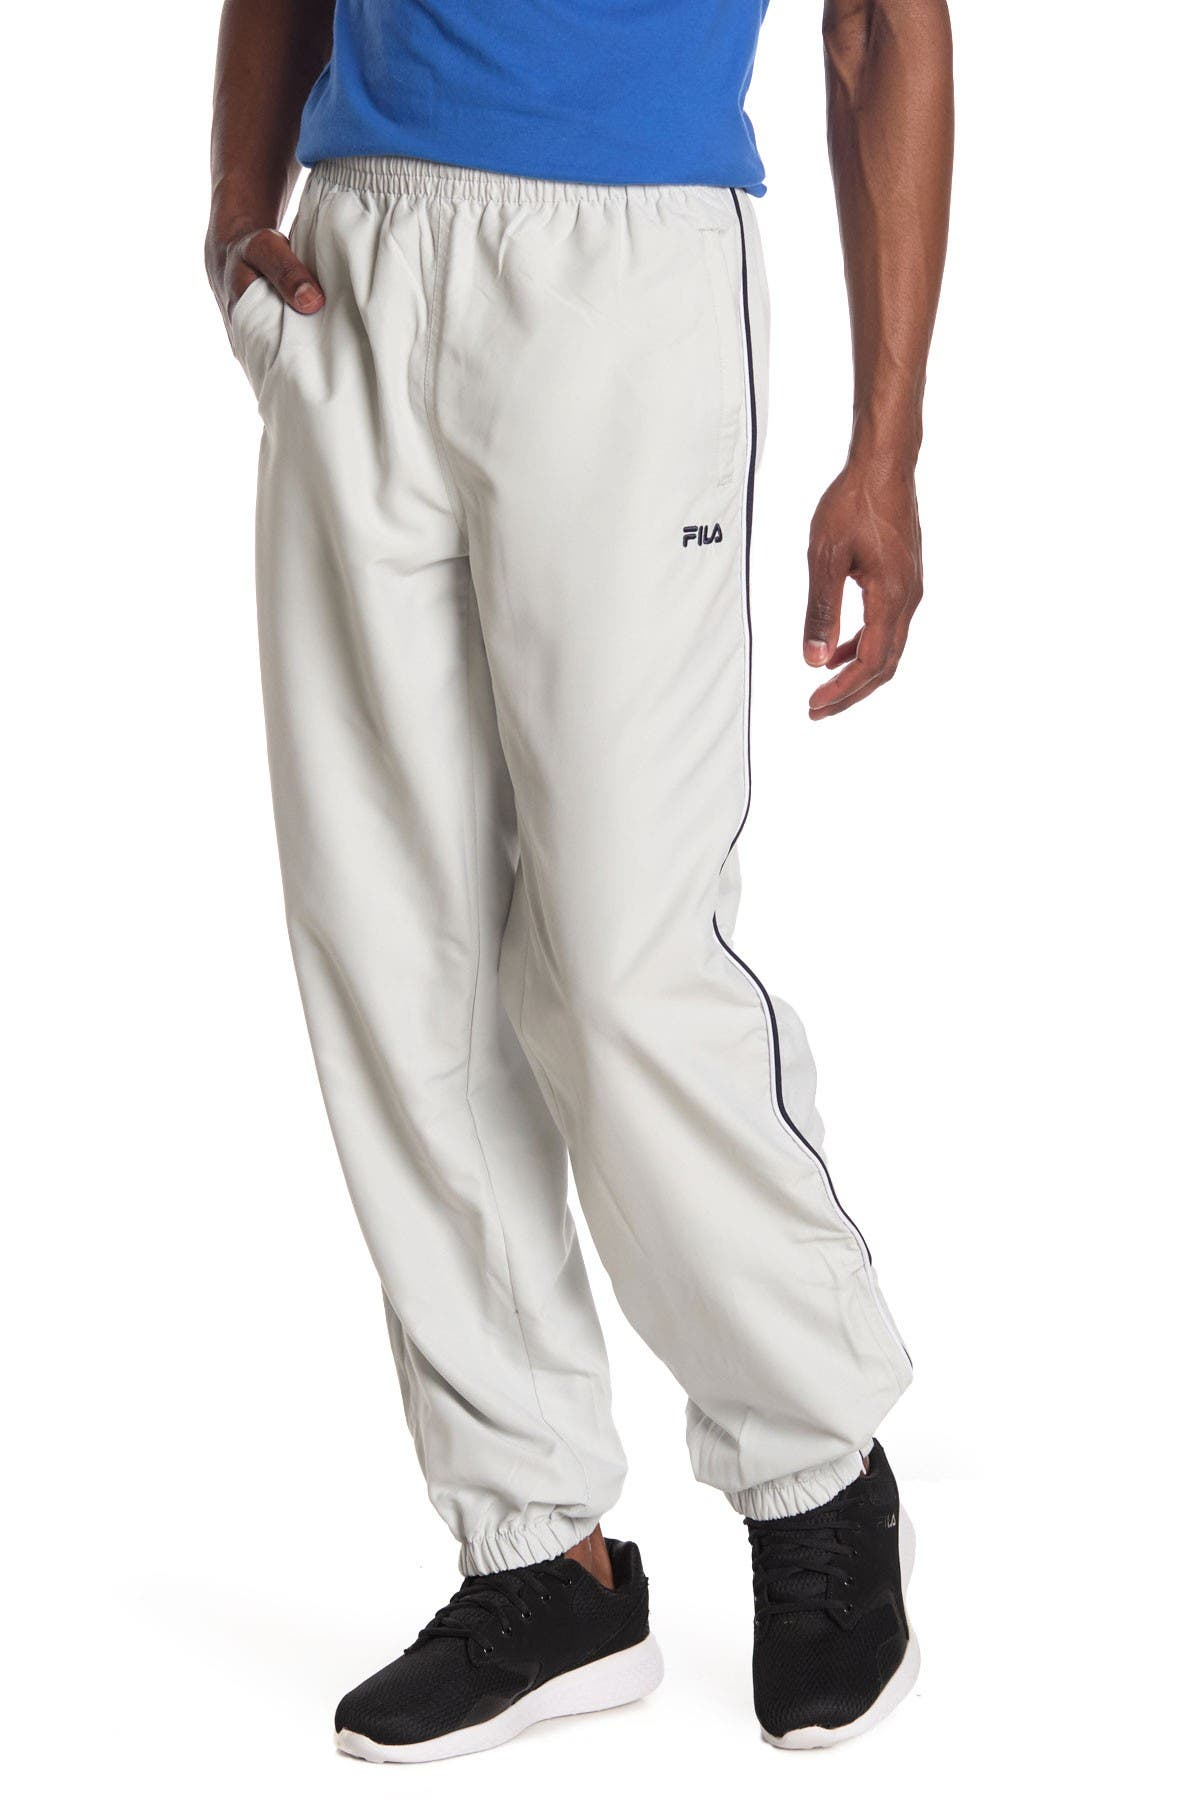 Image of FILA USA Contrast Stripe Sweatpants